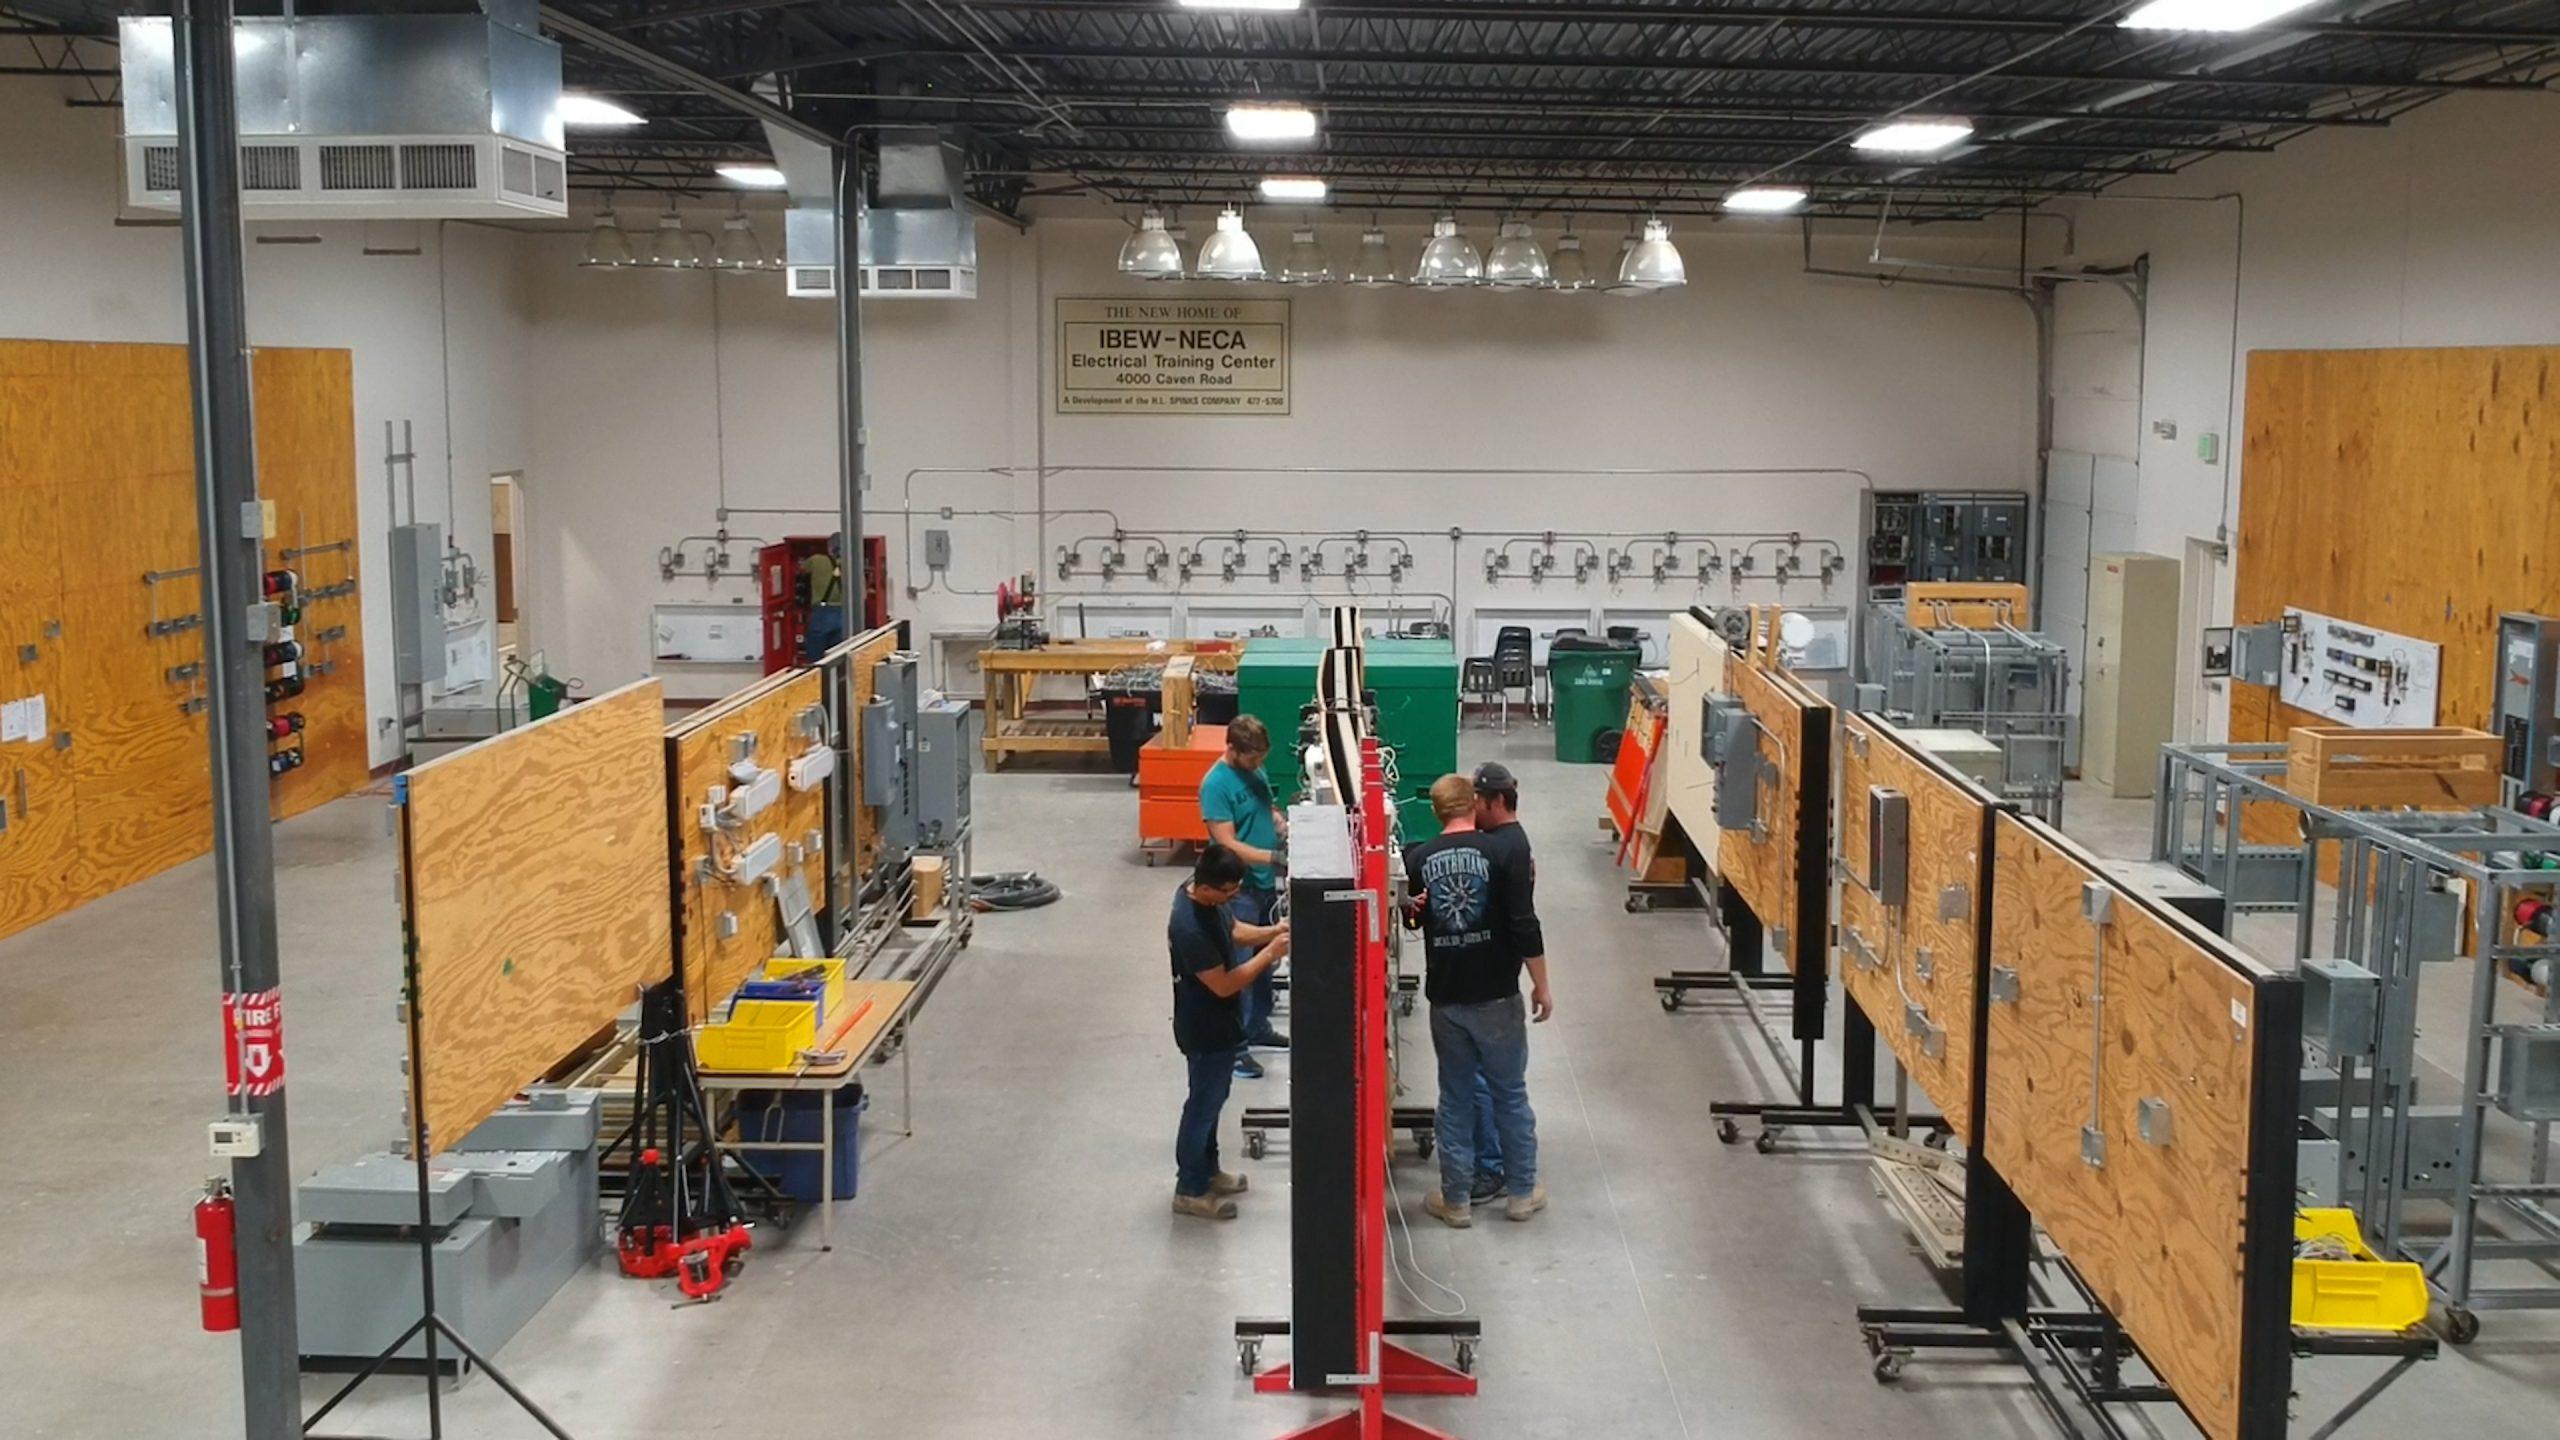 IBEW Local 520 - Electricians - Apprenticeship